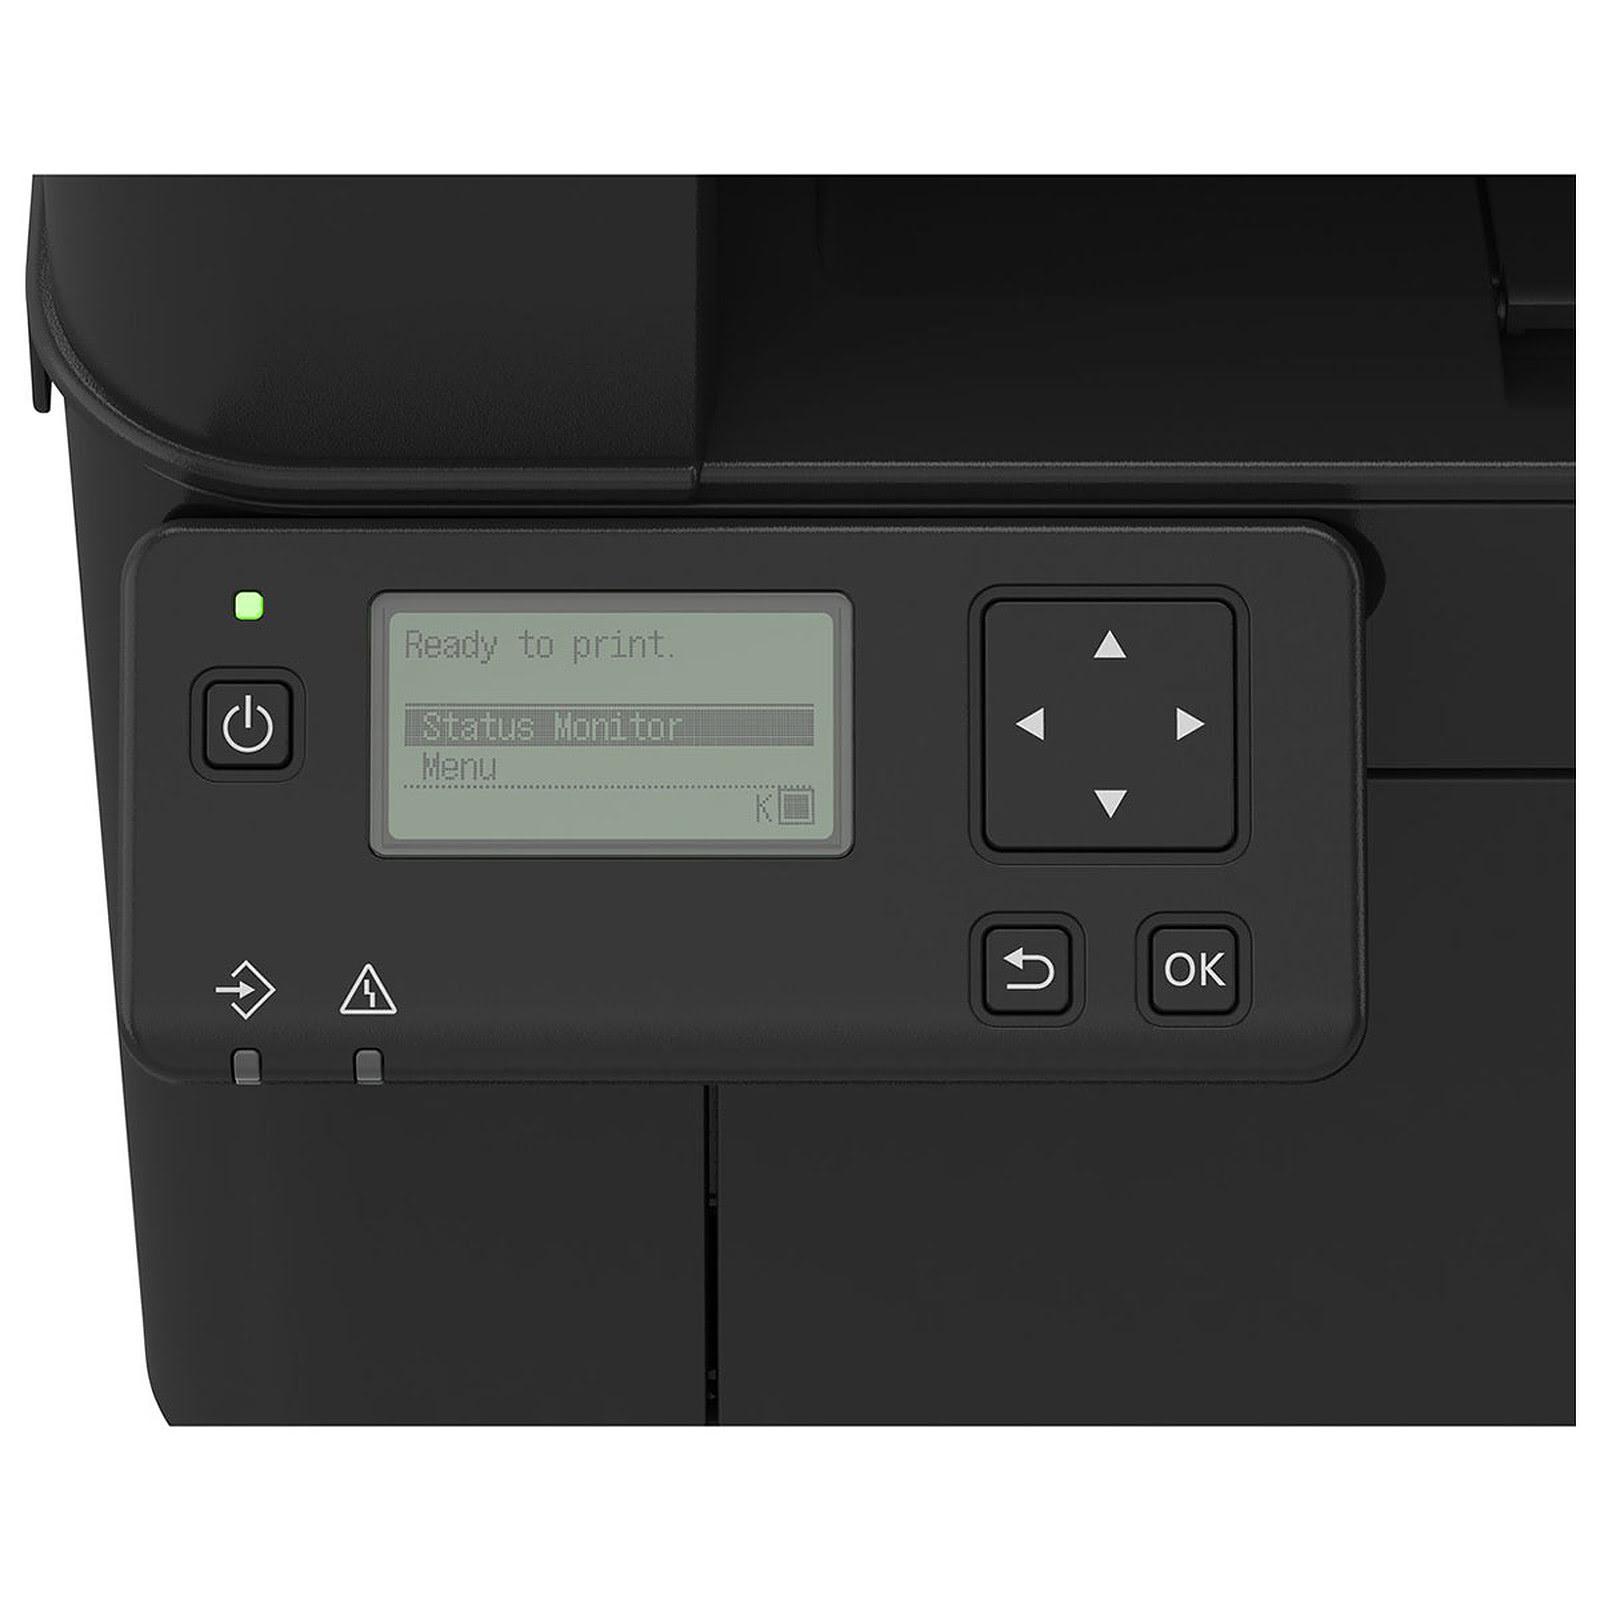 Imprimante Canon I-SENSYS LBP113W - Cybertek.fr - 1